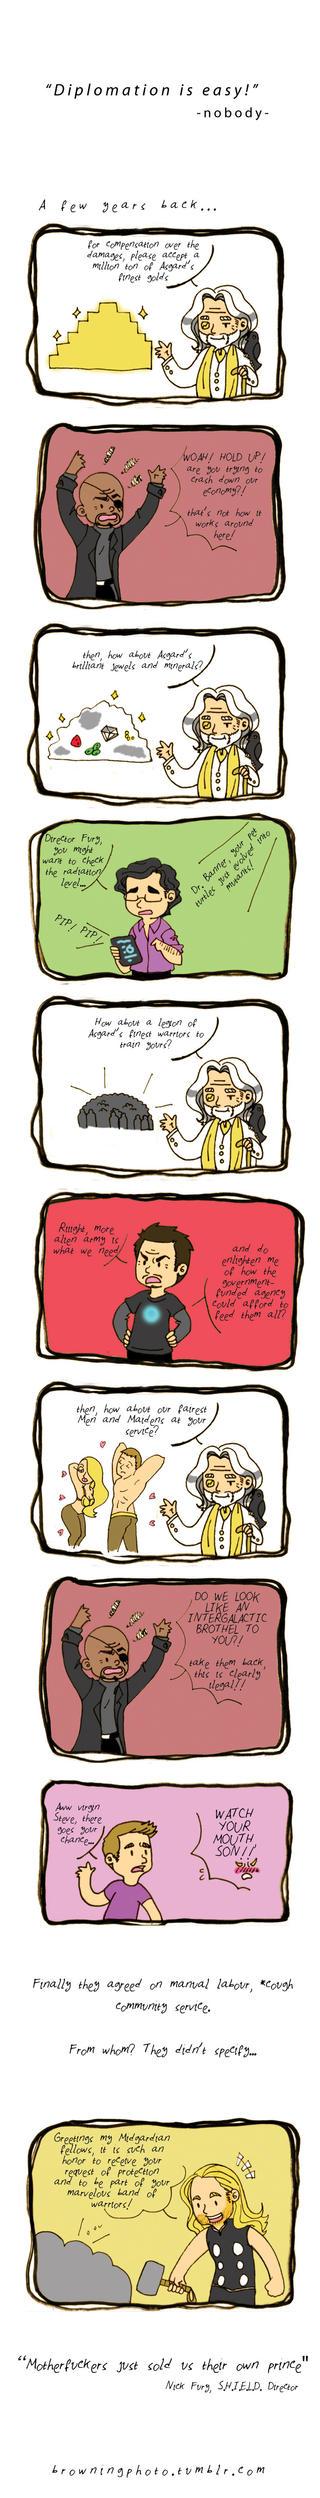 Avengers: Diplomacy by MieKuning